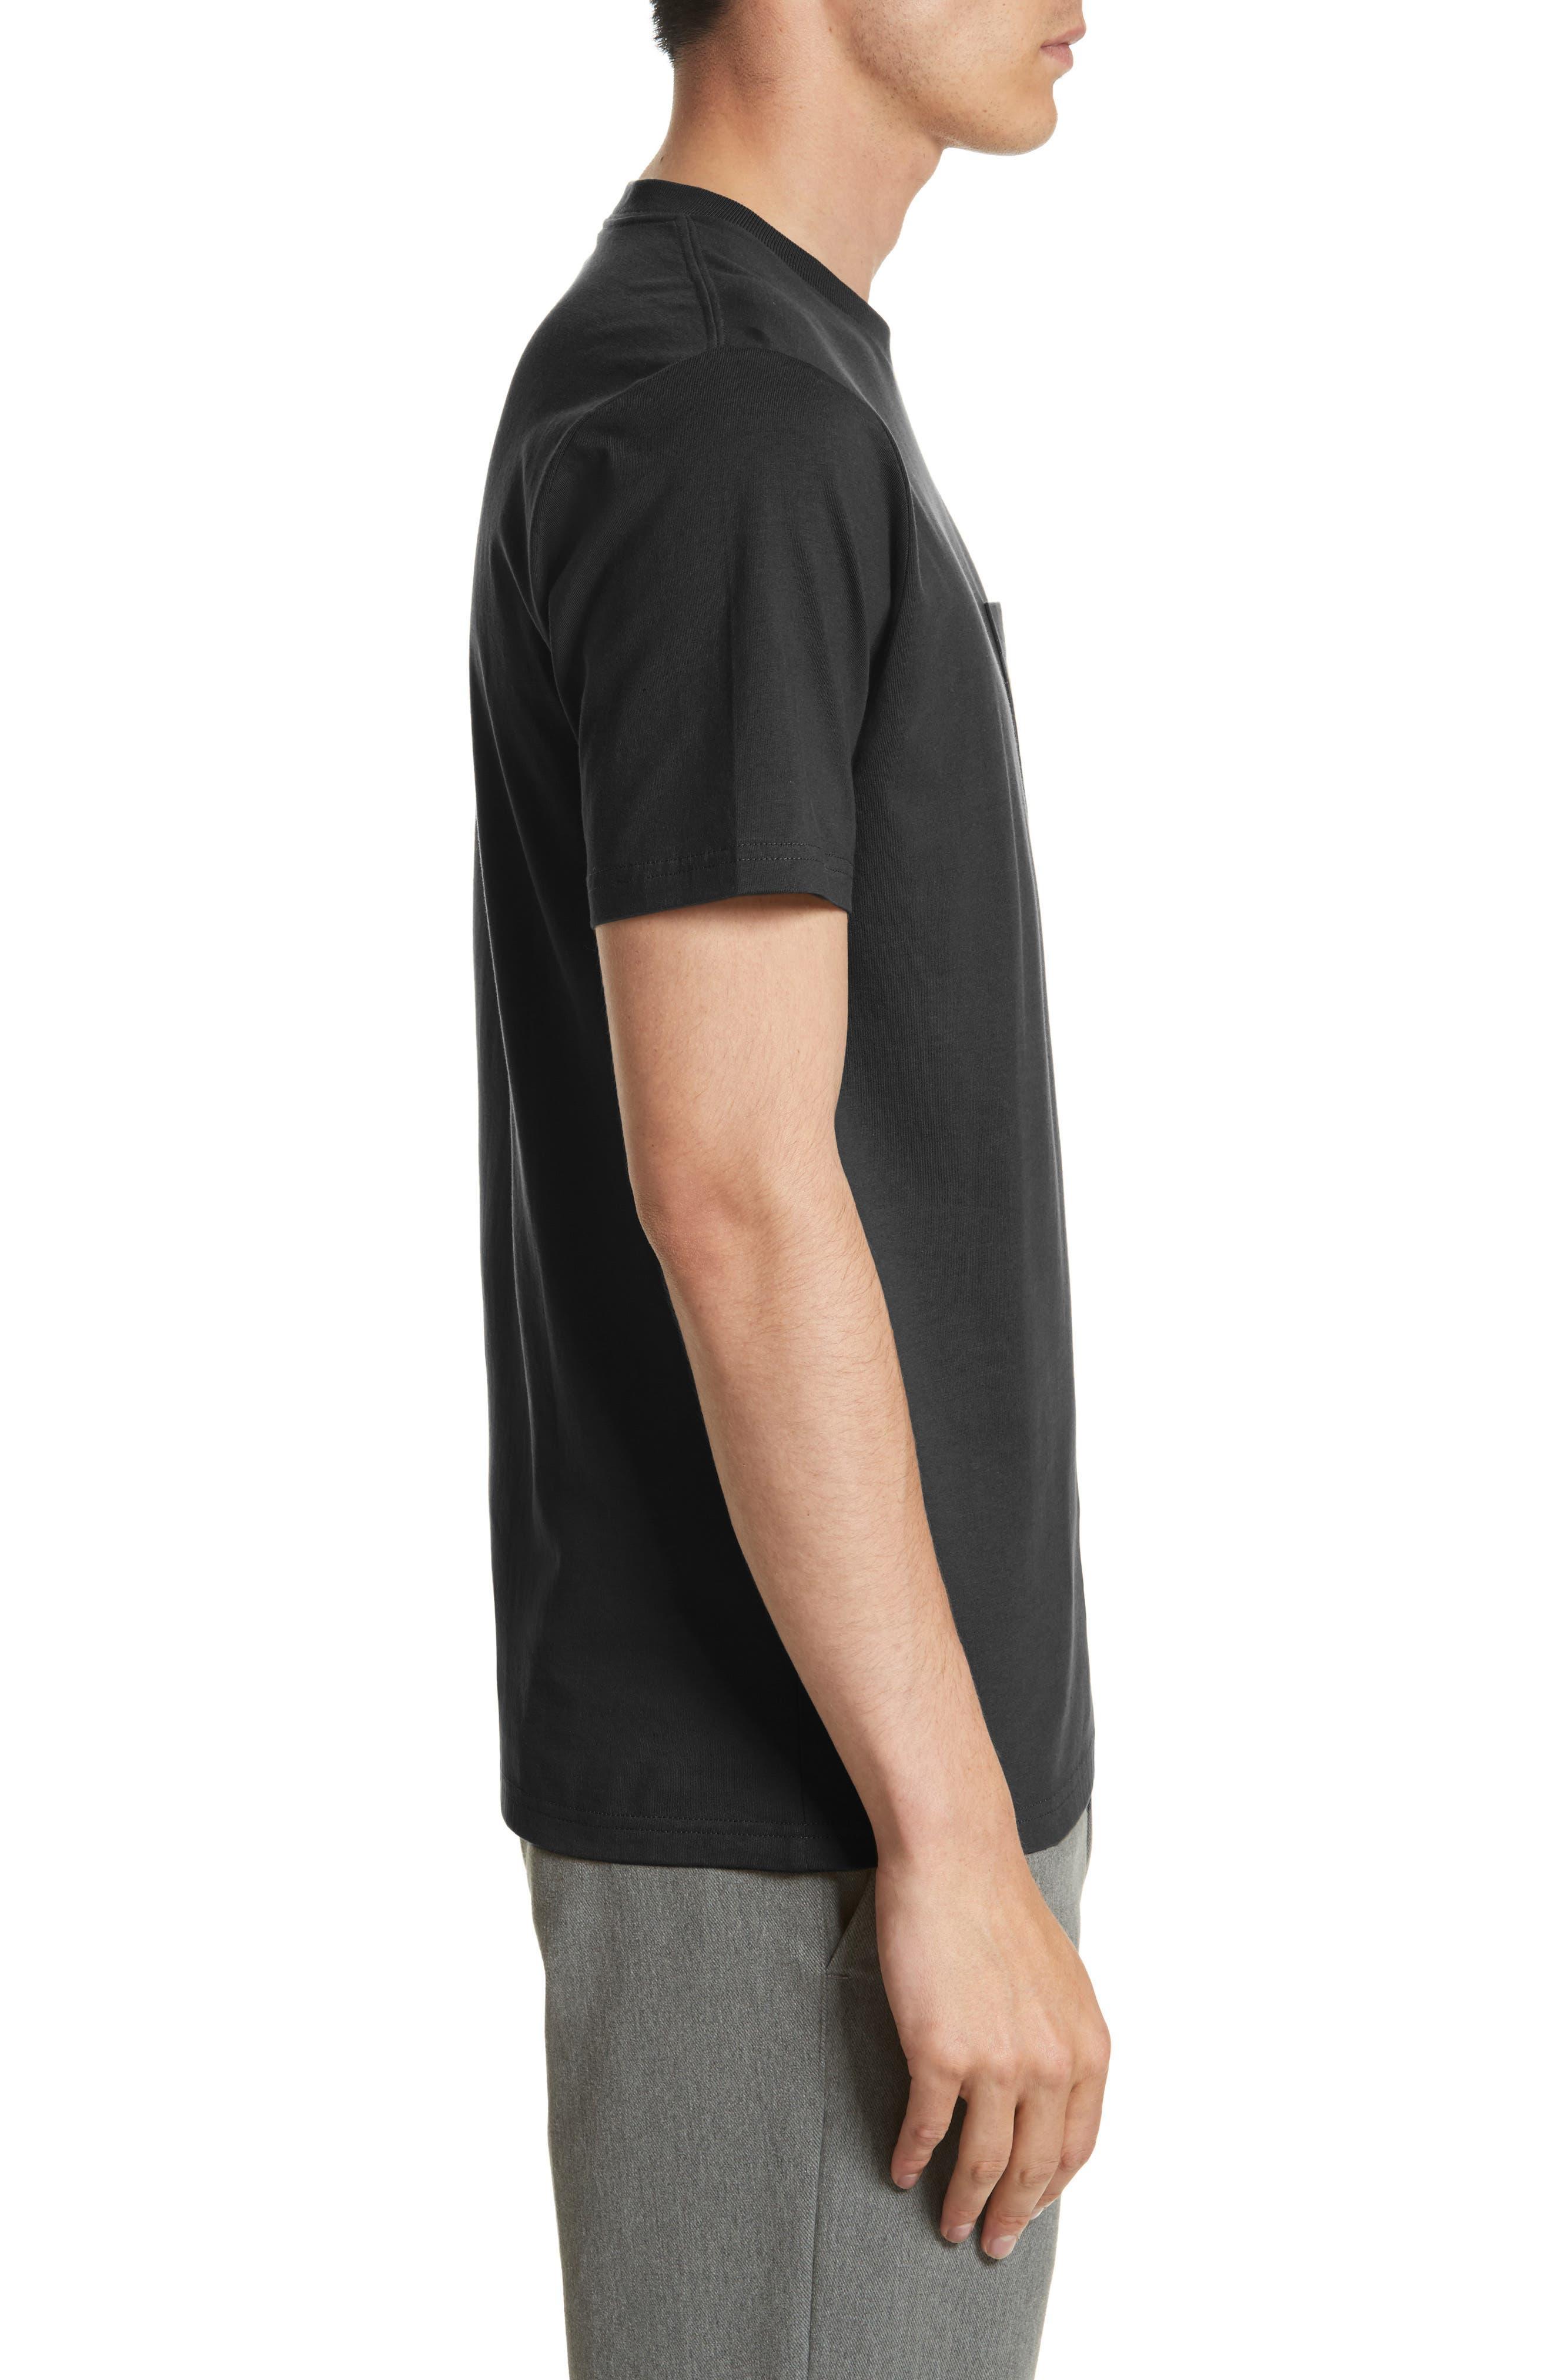 CARHARTT WORK IN PROGRESS, Logo Pocket T-Shirt, Alternate thumbnail 3, color, BLACK